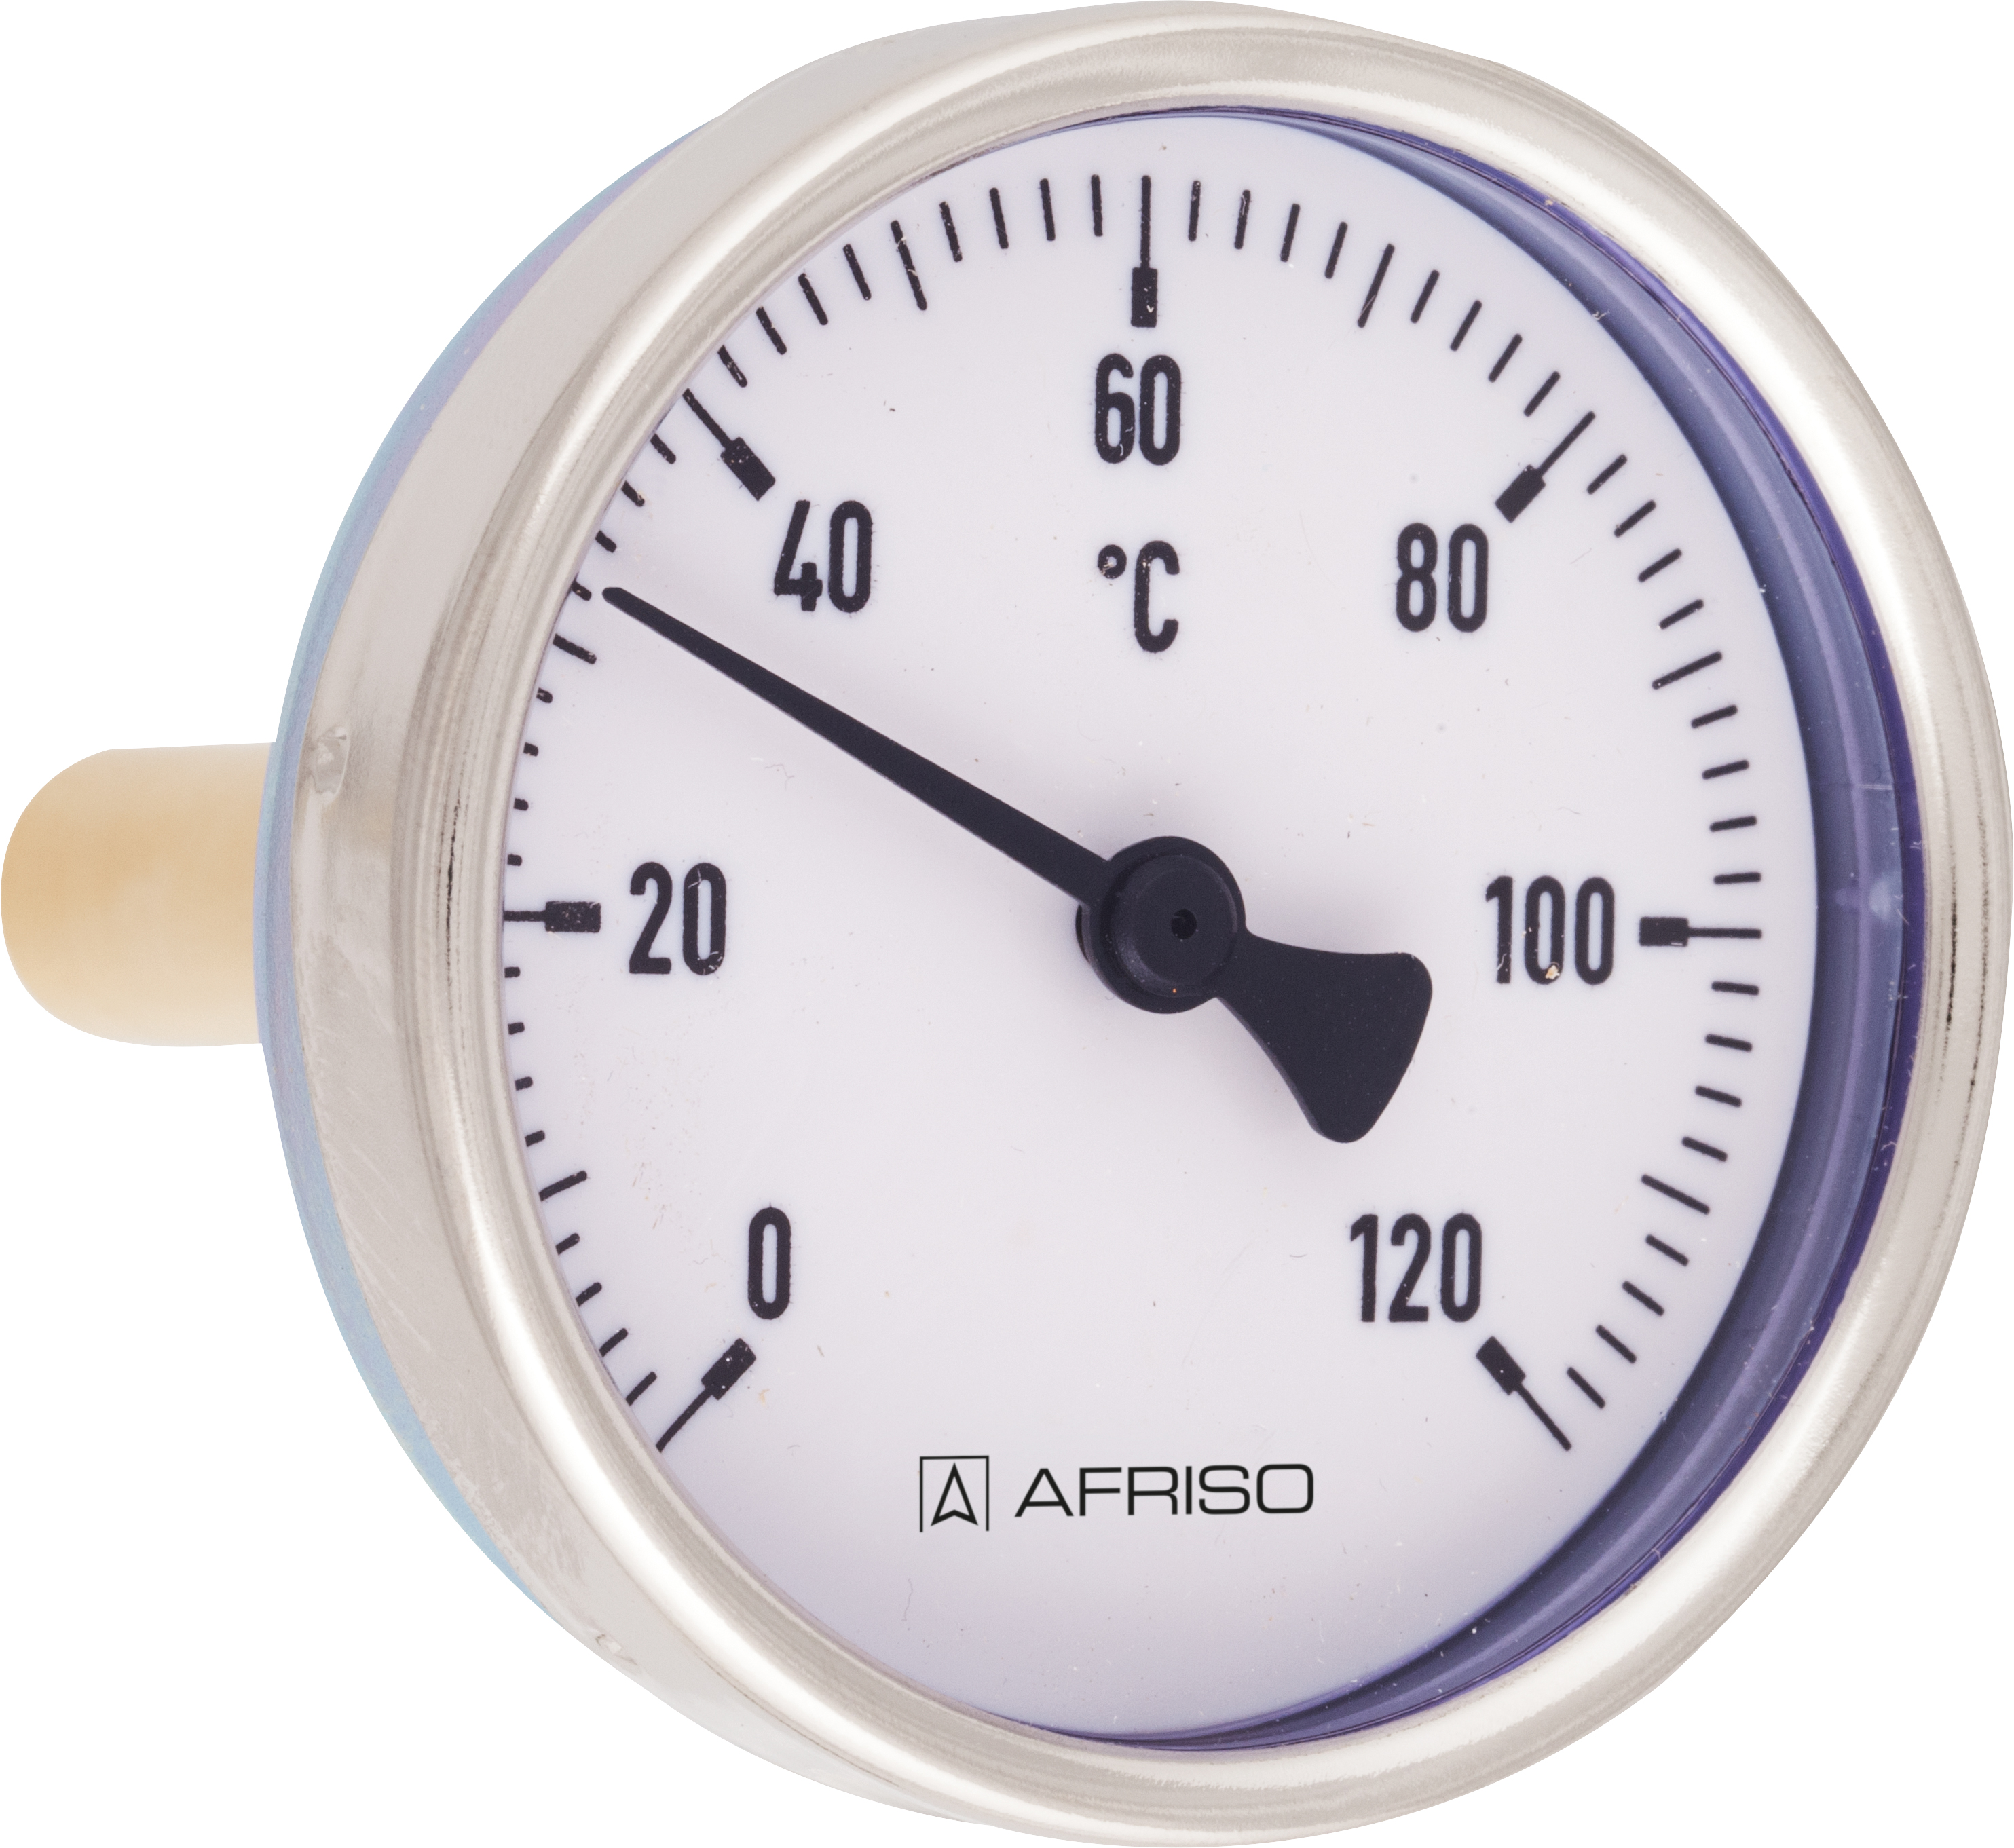 Termometr bimetaliczny BiTh 100 E, D302, fi100 mm, -20÷60°C, L 150 mm, rad, kl. 1